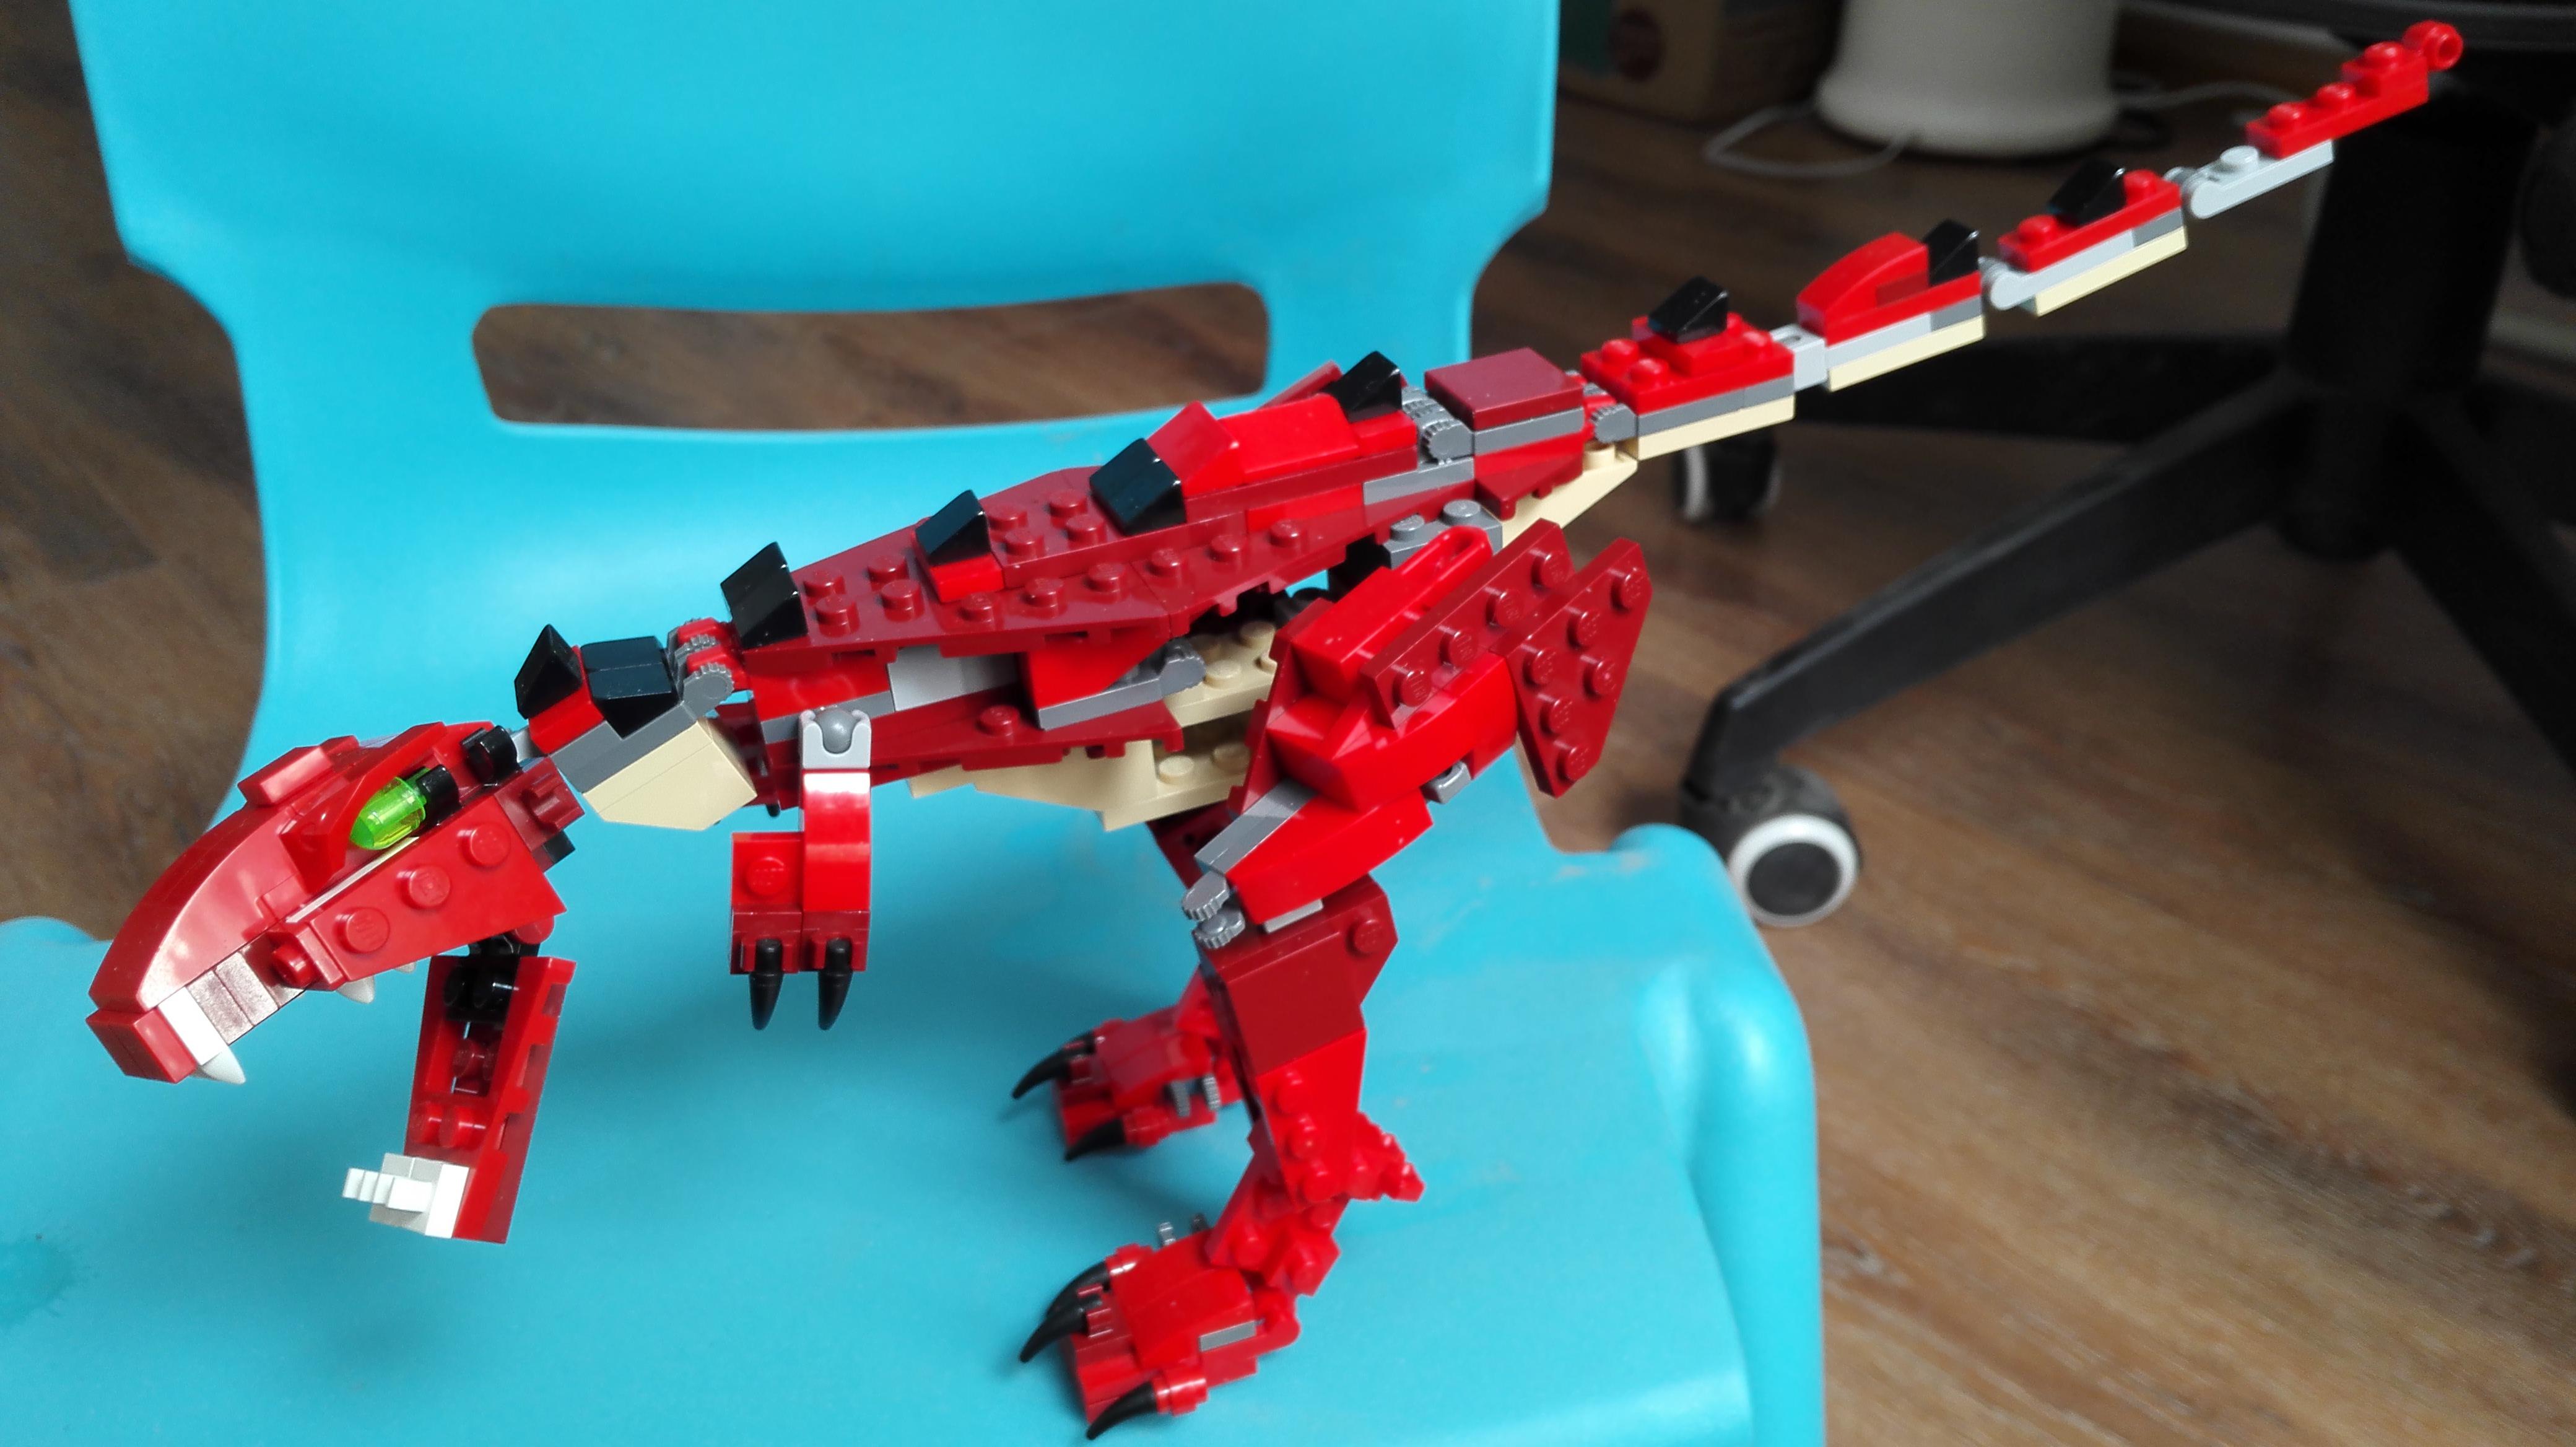 T Rex Alternative Build Of 31032 And Instructions Bricksafe